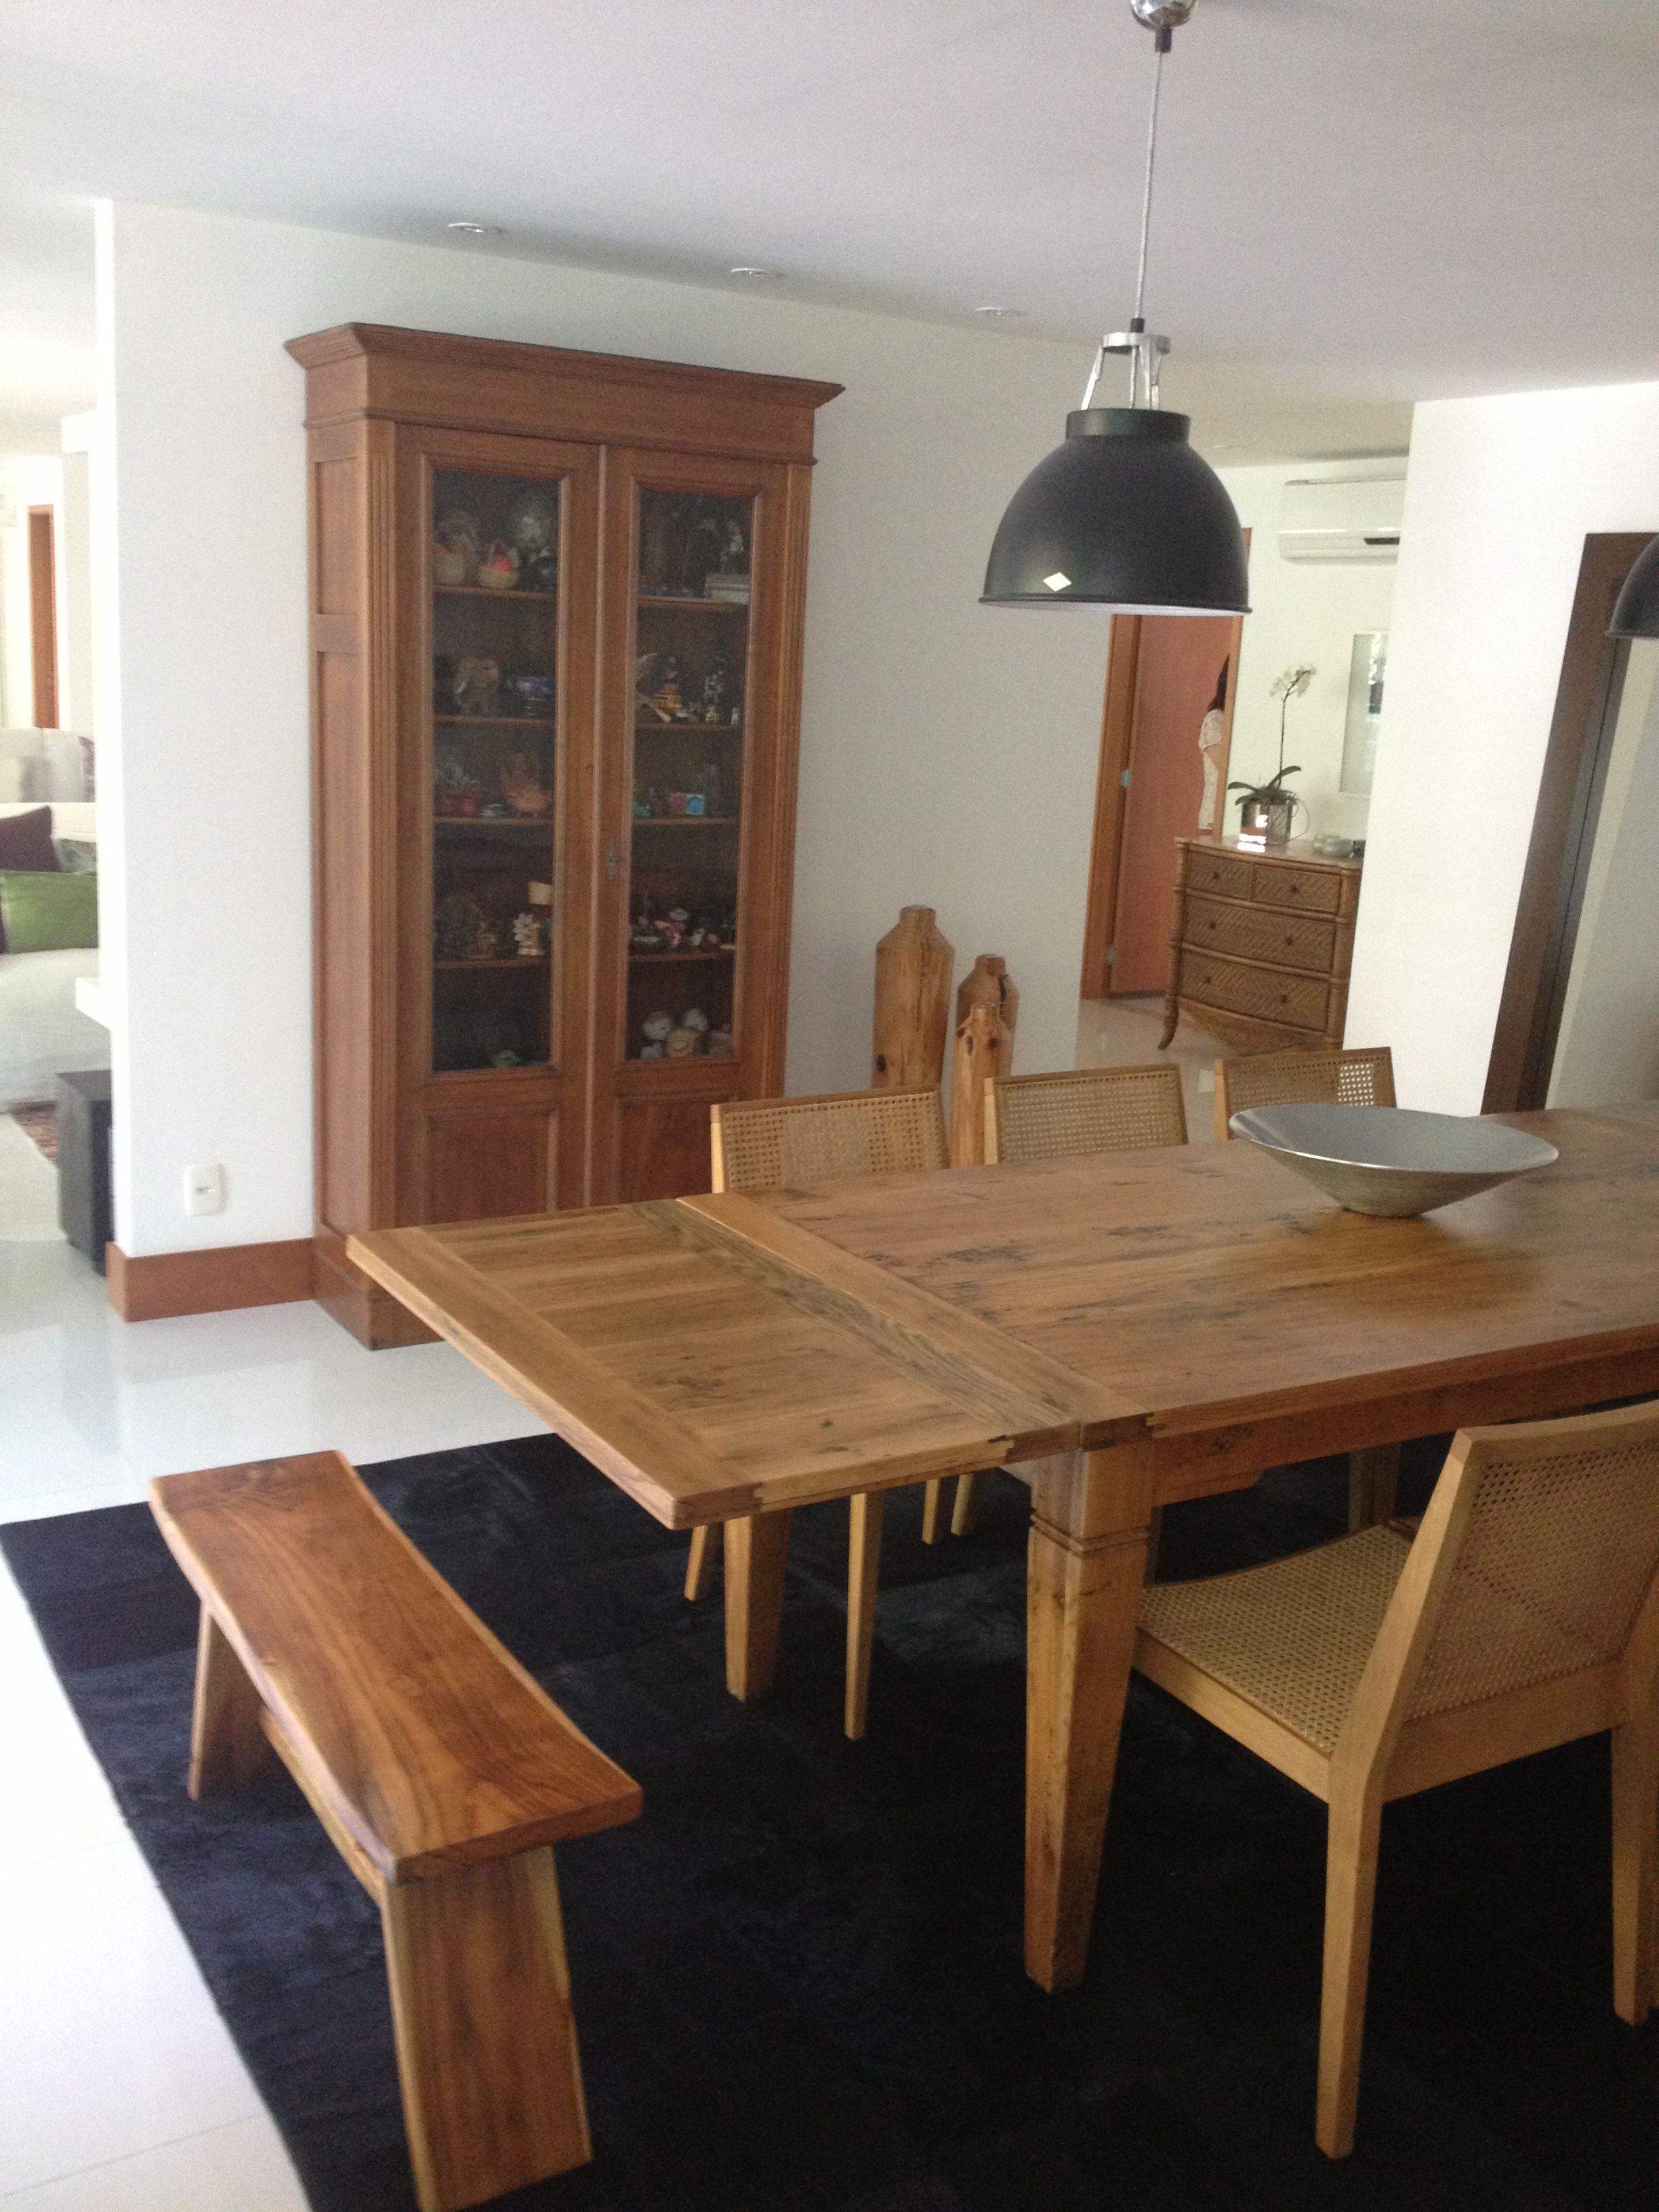 Sala de Jantar 1 - Leblon